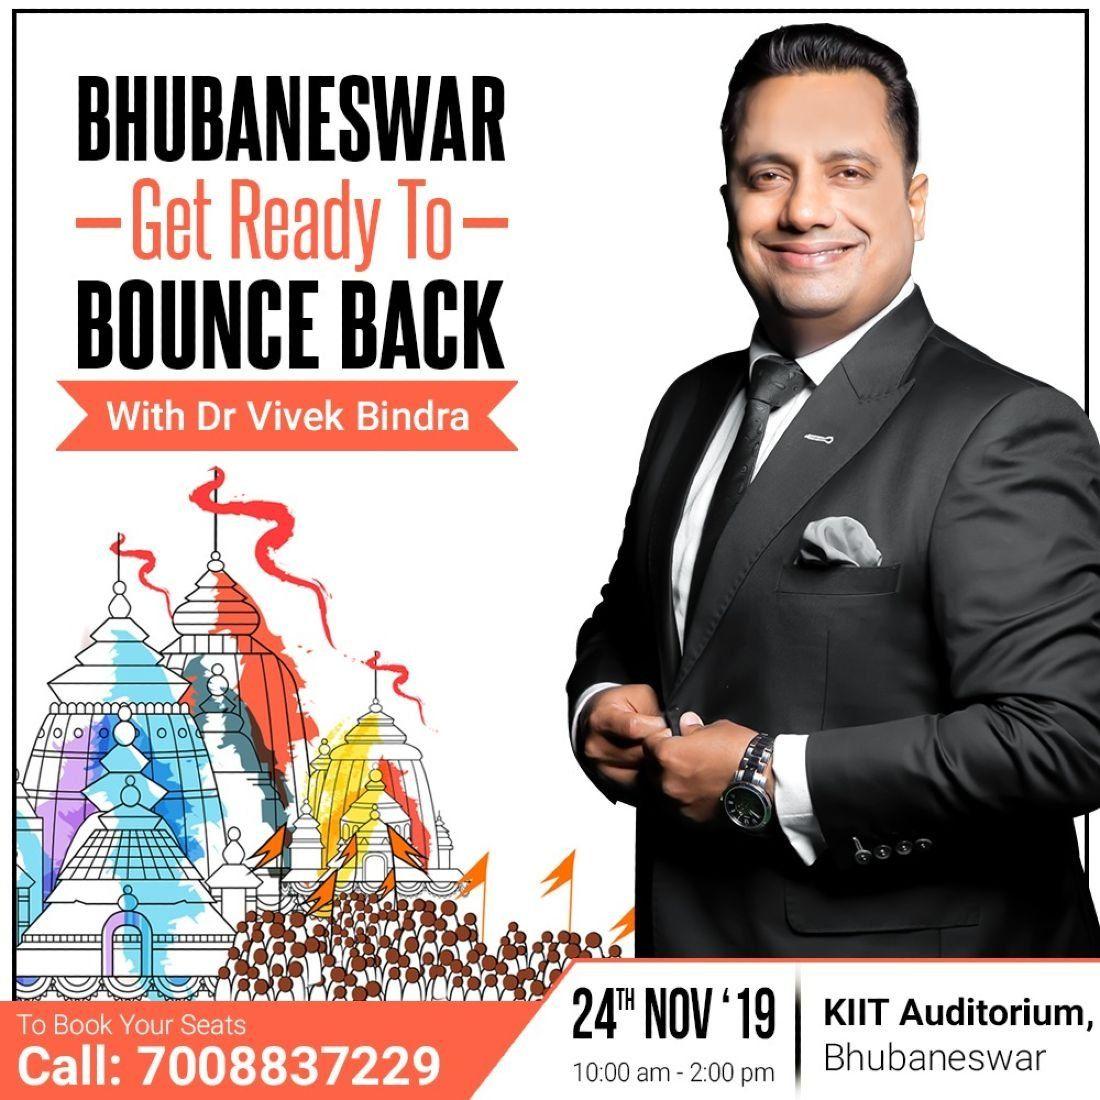 Bounce Back Bhubaneswar by Dr. Vivek Bindra